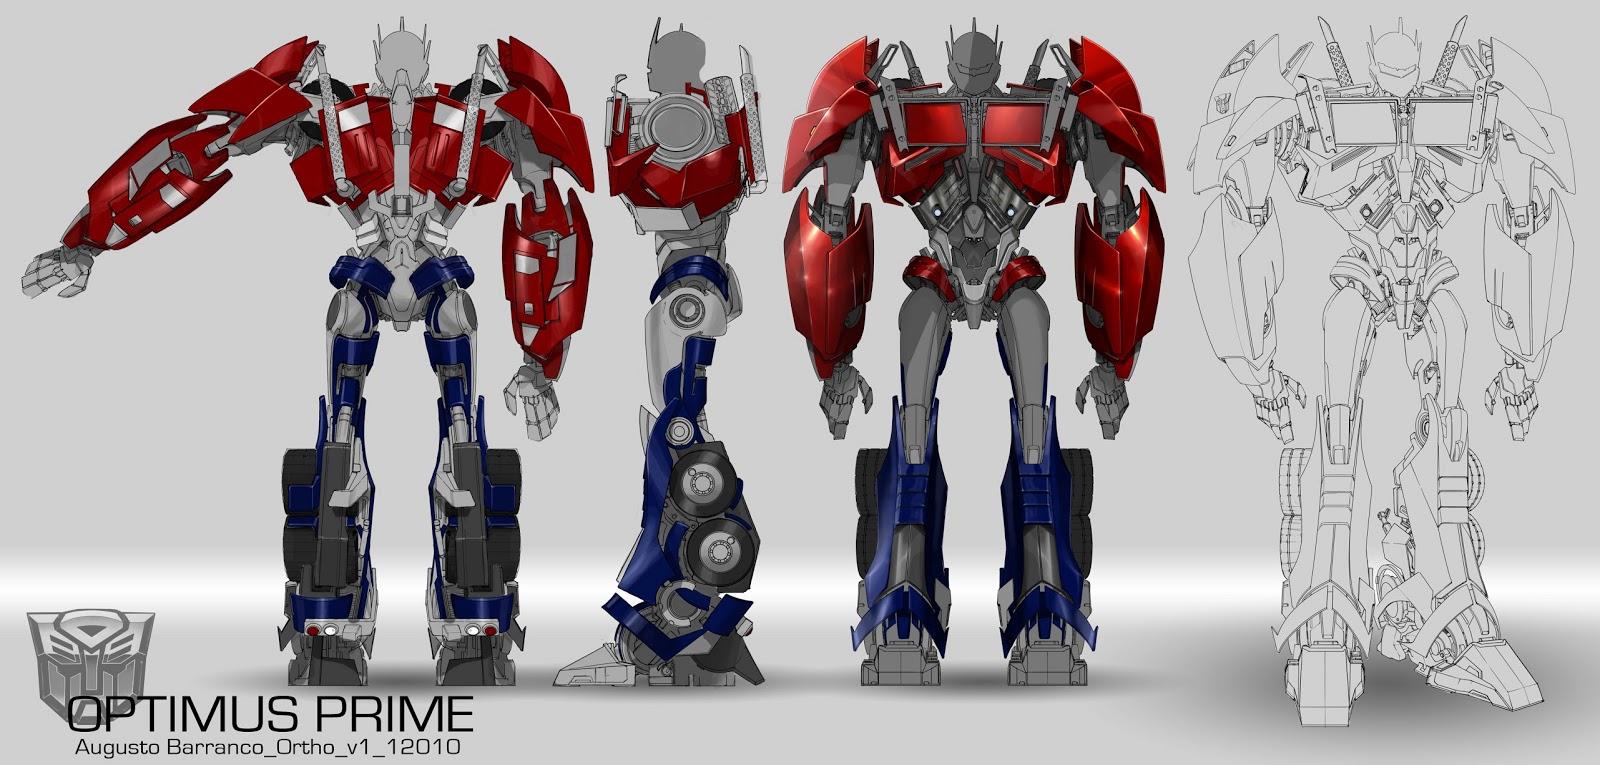 Augusto Barranco: Transformers Prime unloaded